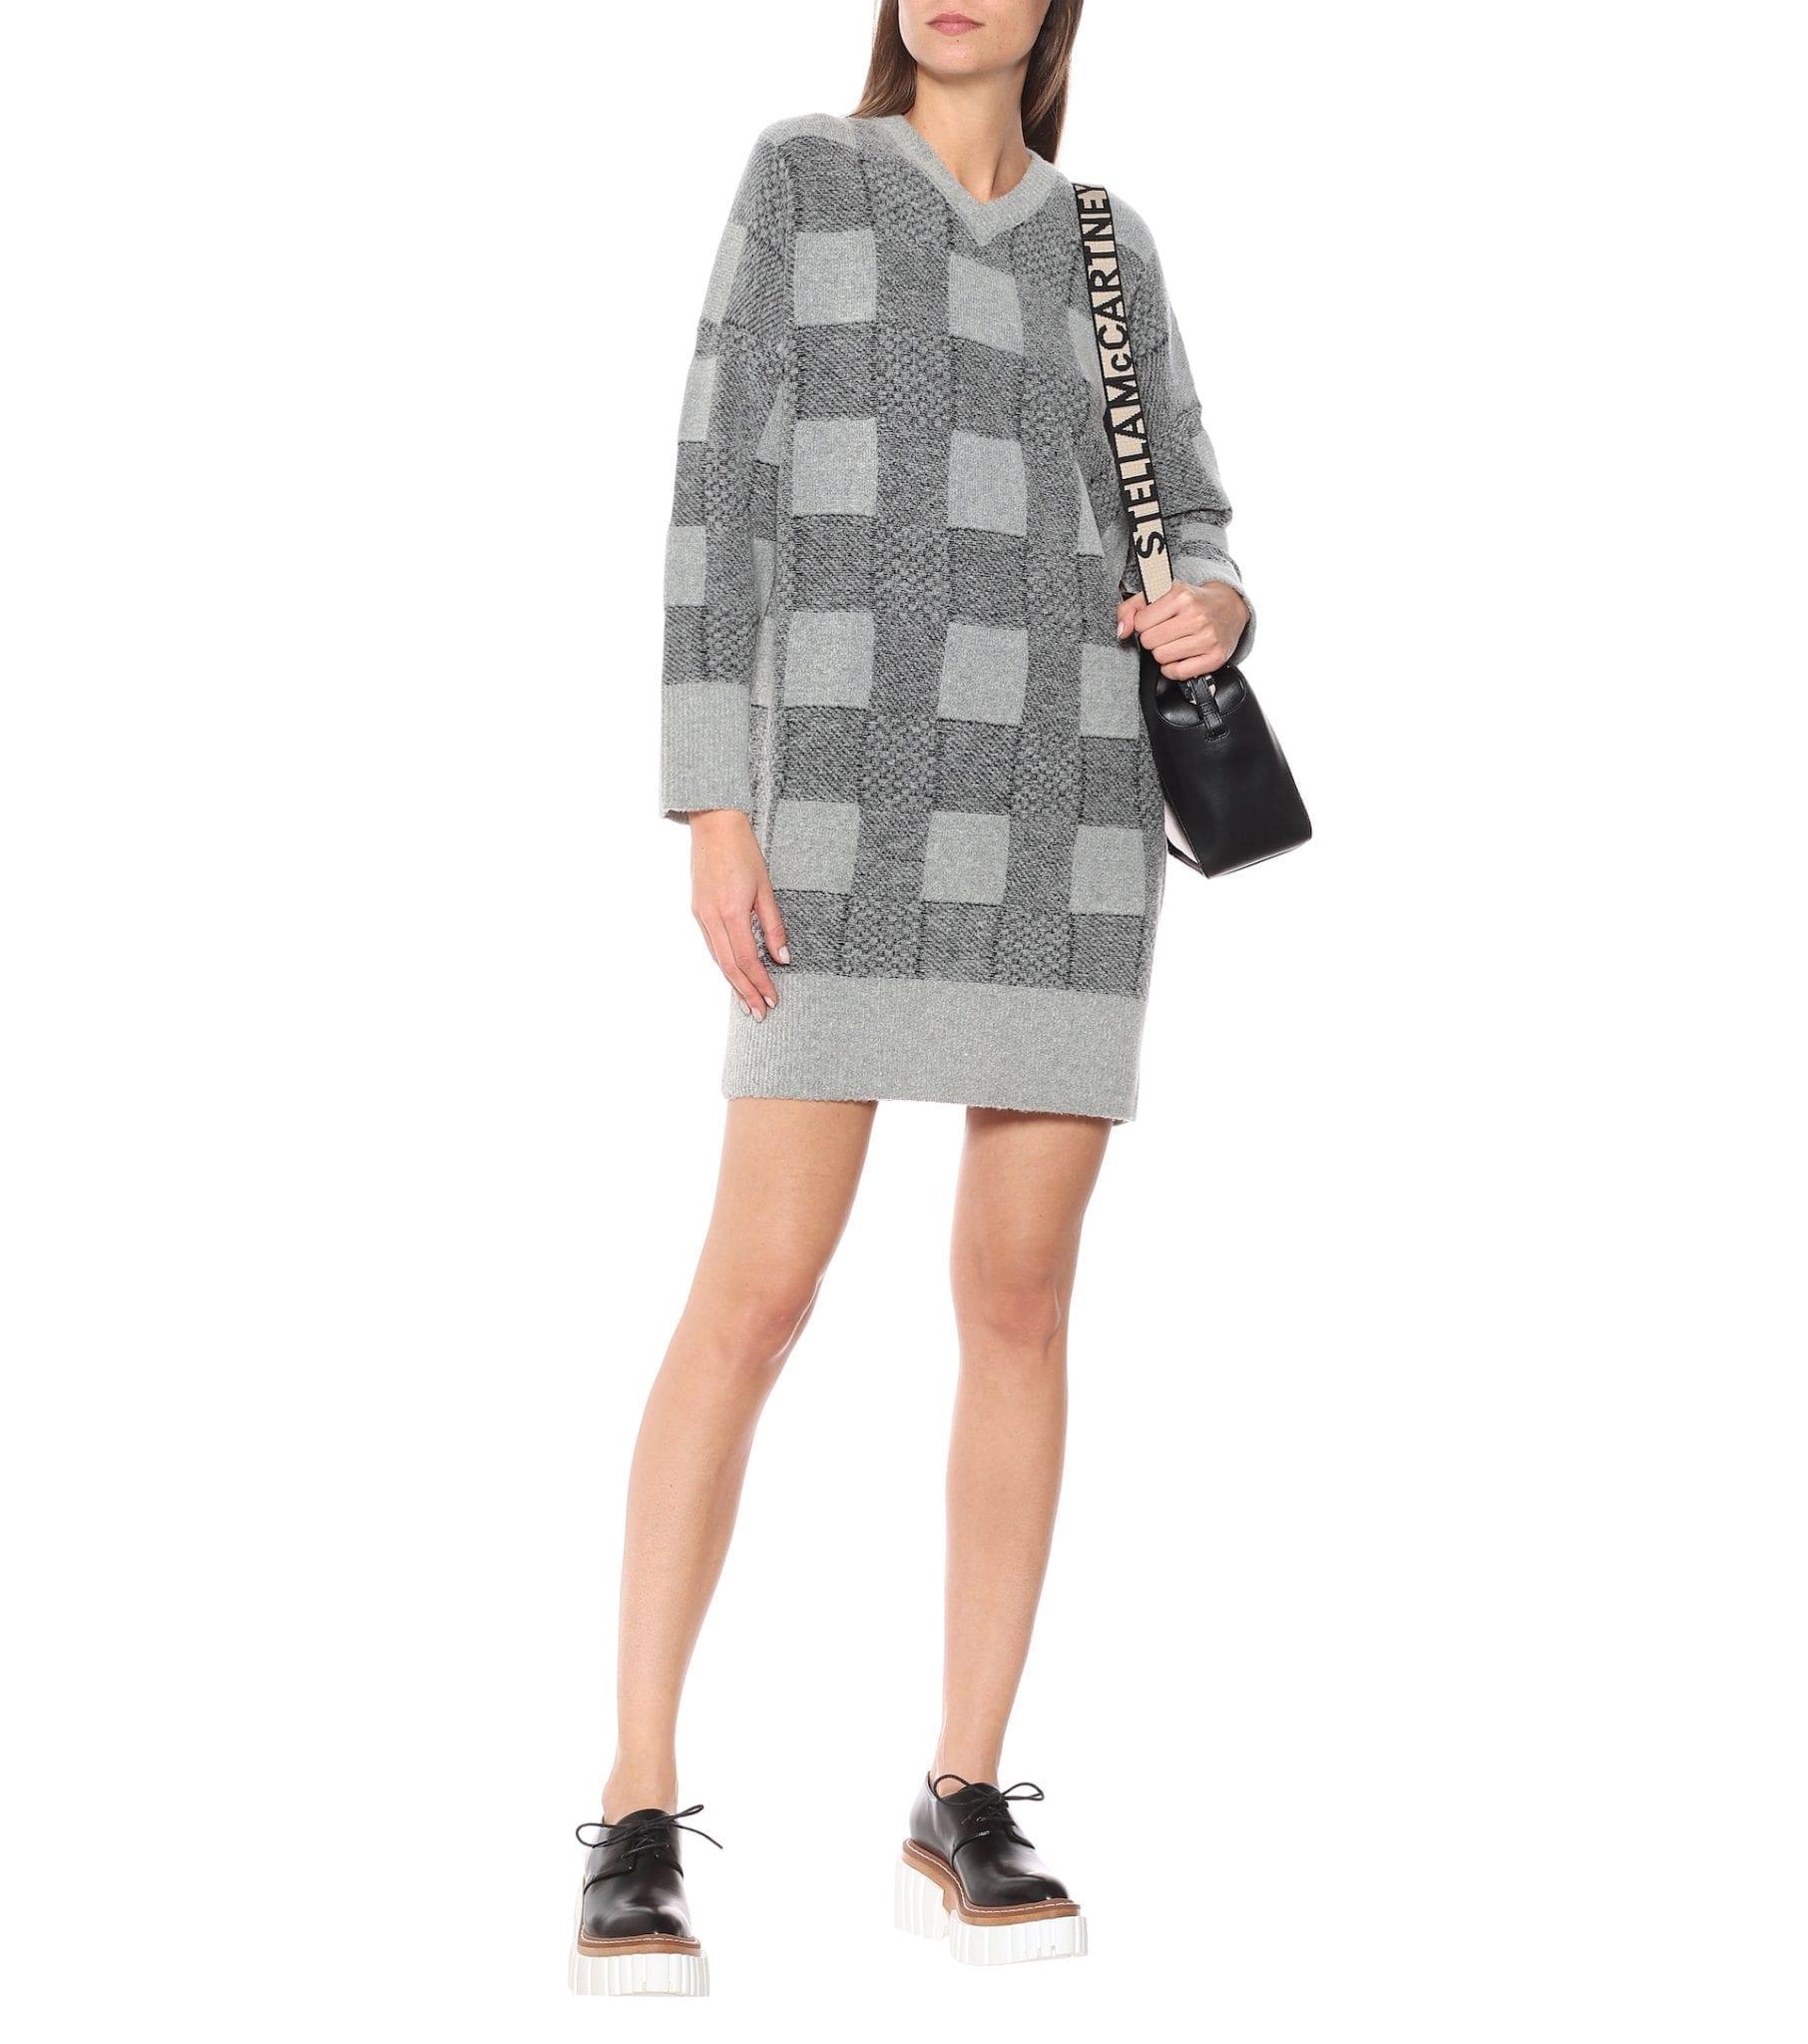 STELLA MCCARTNEY Checked Wool-blend Sweater Dress